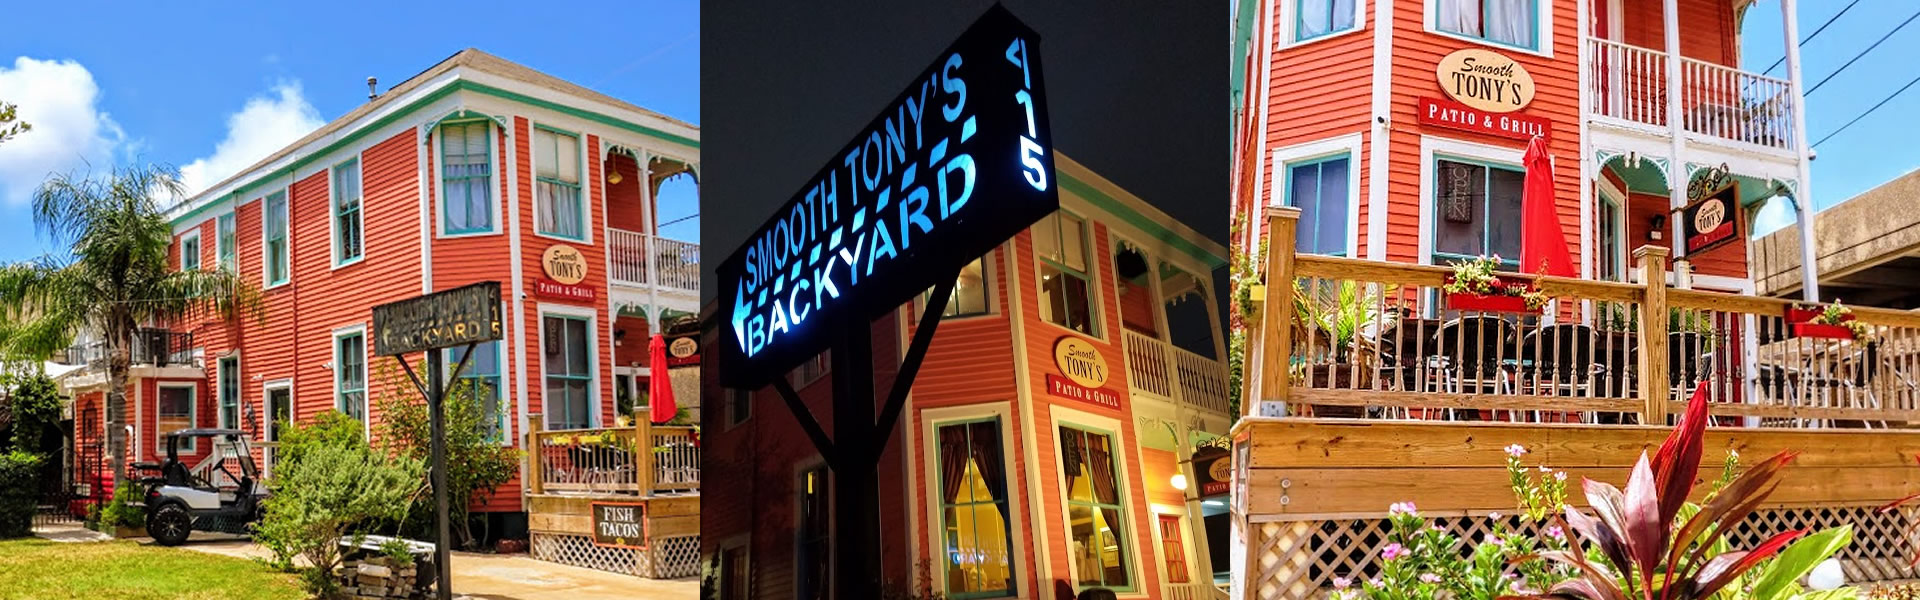 Smooth Tony's Patio & Grill, Galveston TX